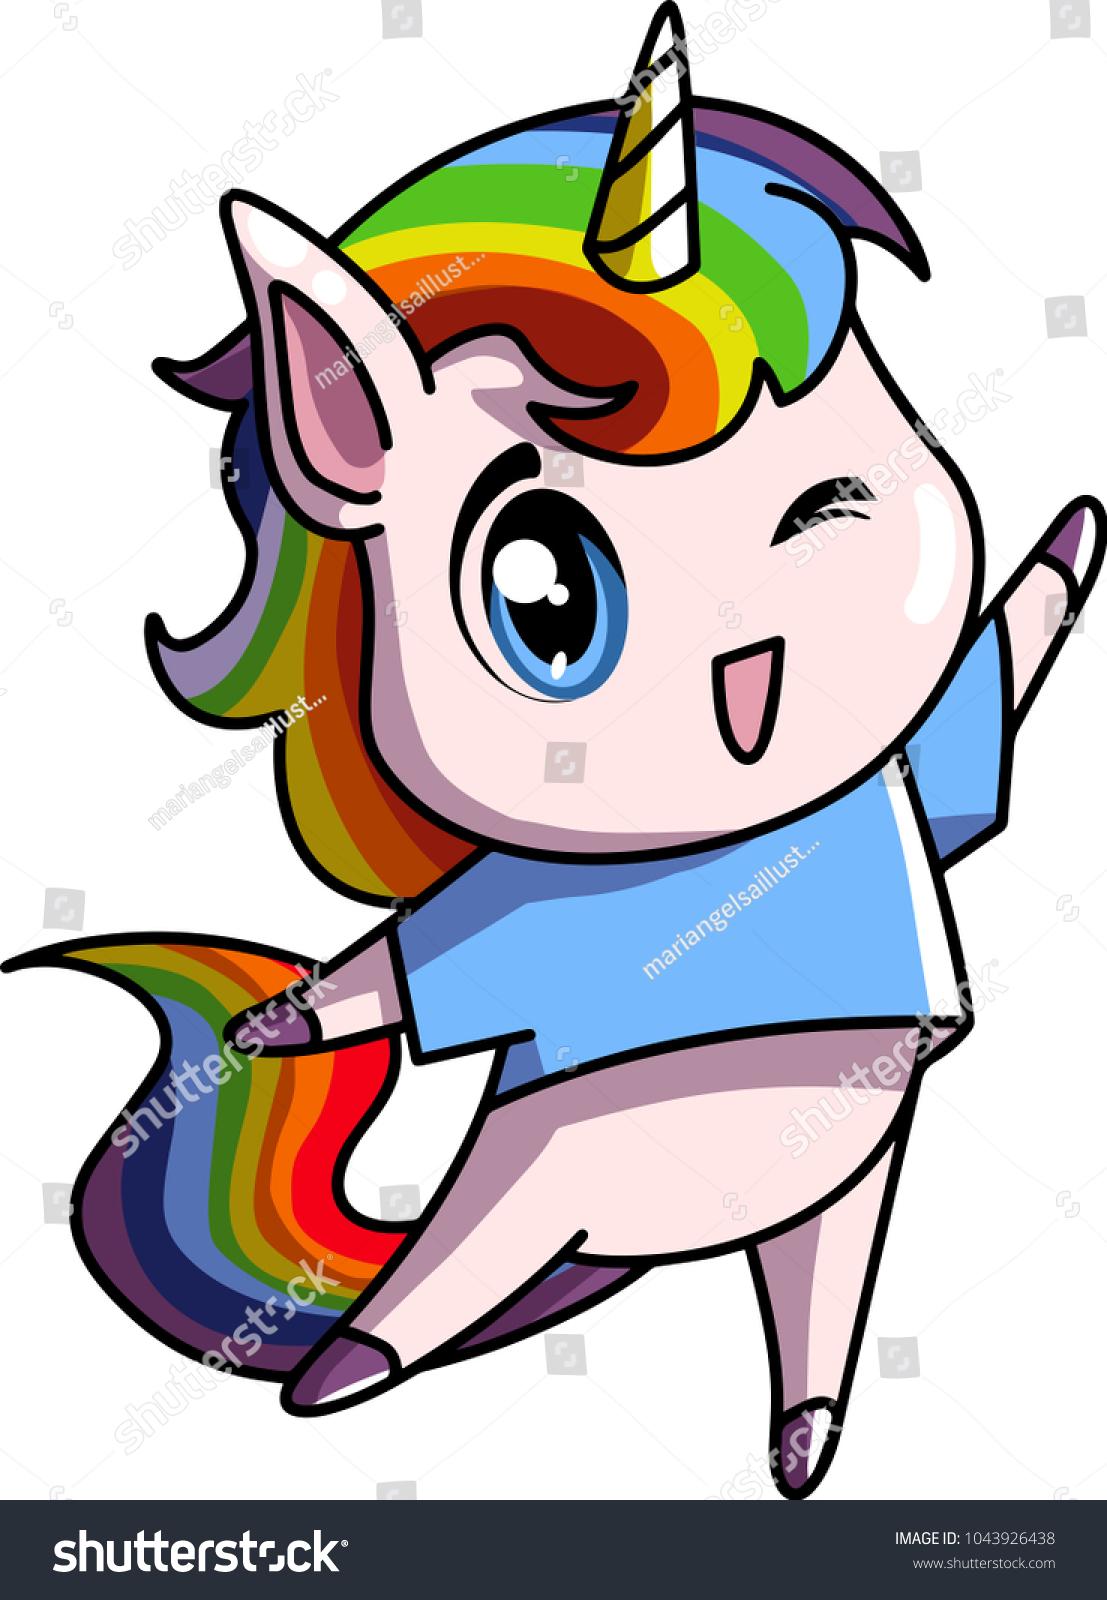 Little Chibi Cute Baby Unicorn Rainbow Hair Female Pastel Colors Vector Illustration